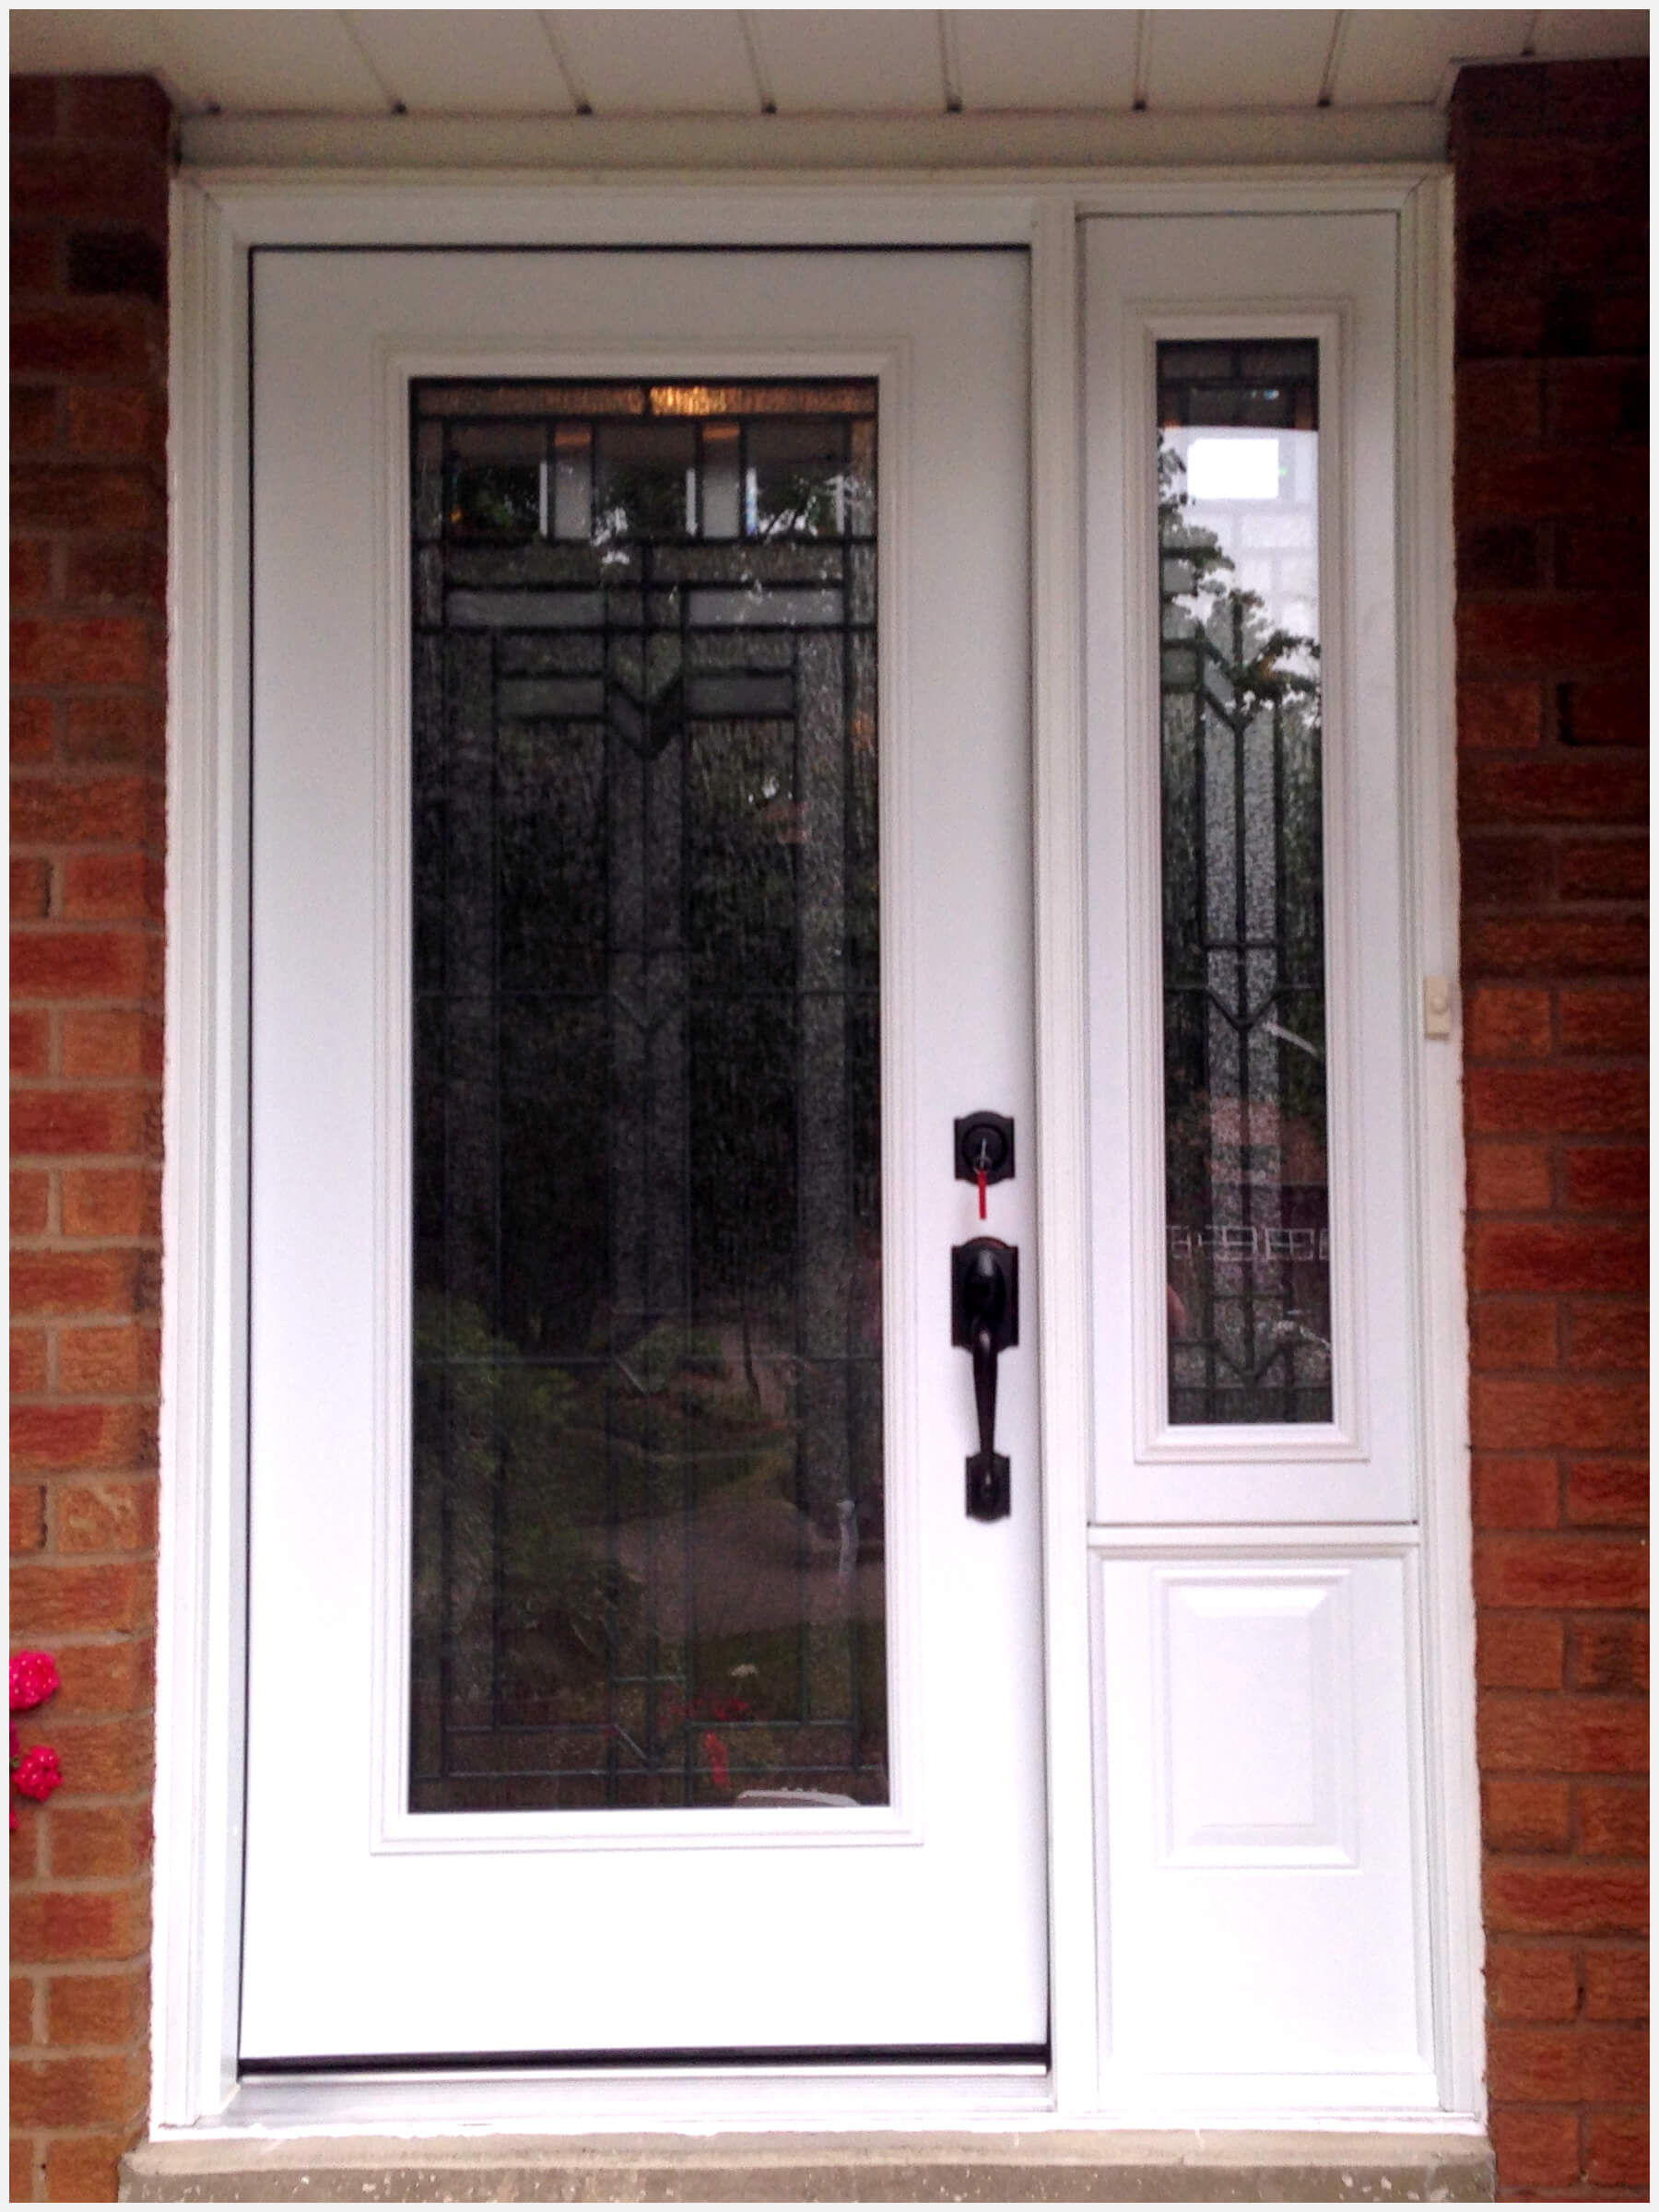 2400 #C2093A Entry Door 001 Square wallpaper Premium Fiberglass Entry Doors 39251800